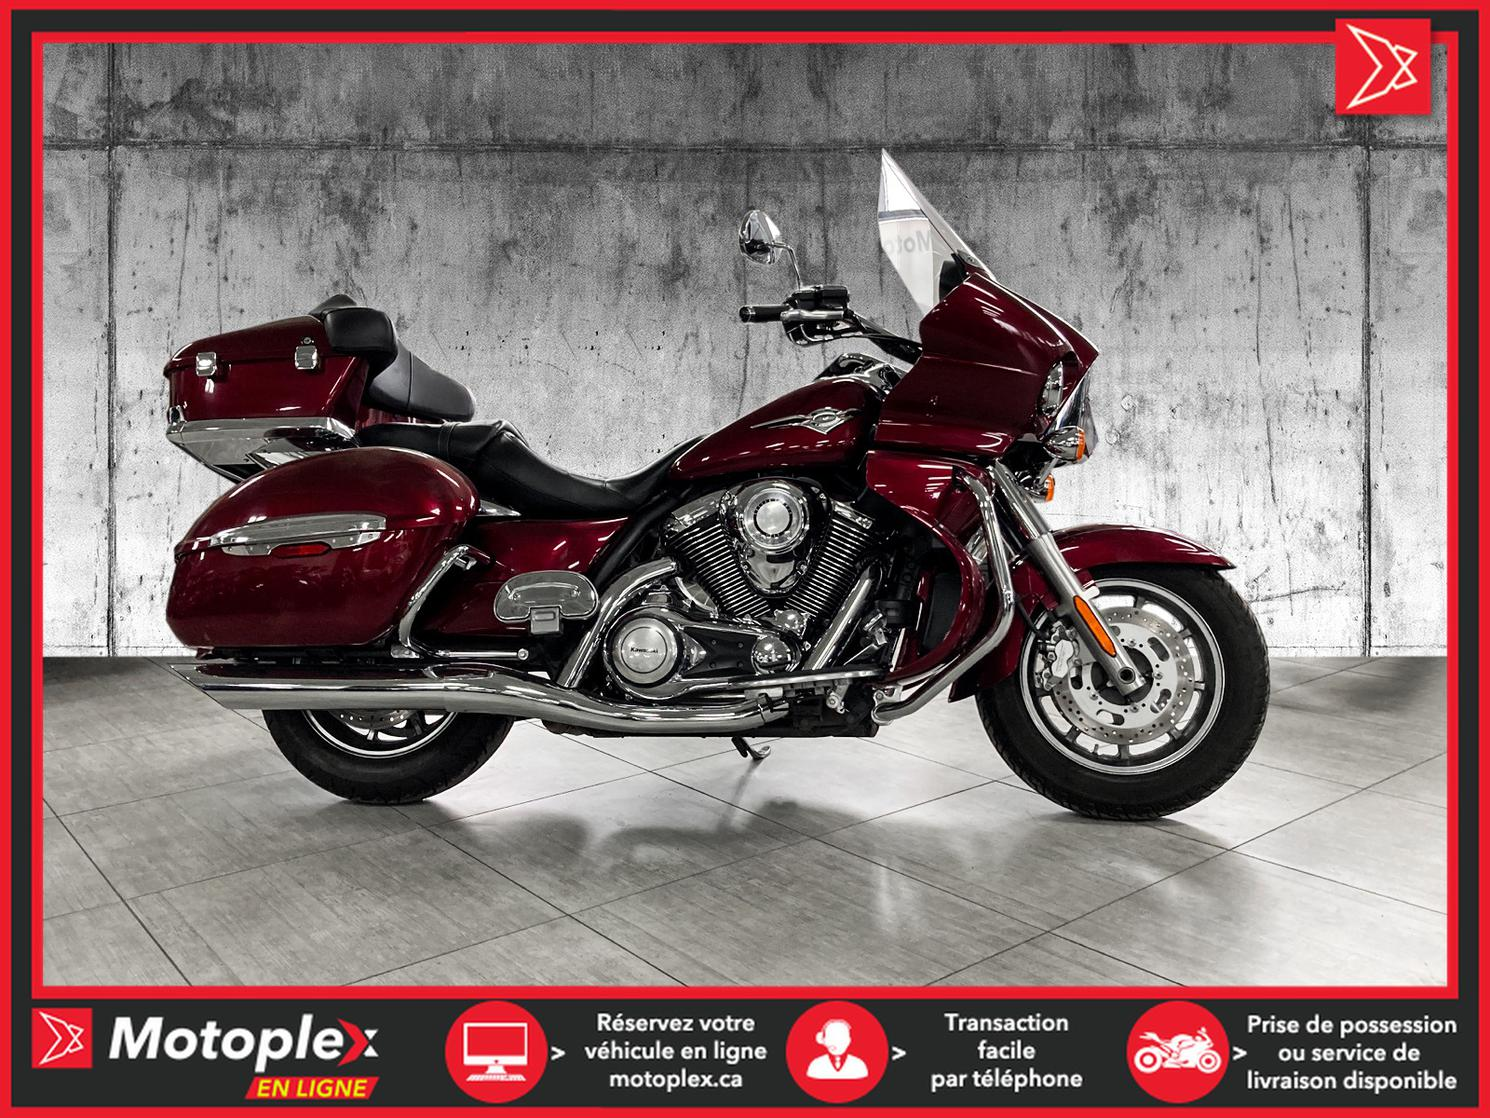 2009 Kawasaki VOYAGER 1700 VULCAN 1700 48$/SEMAINE